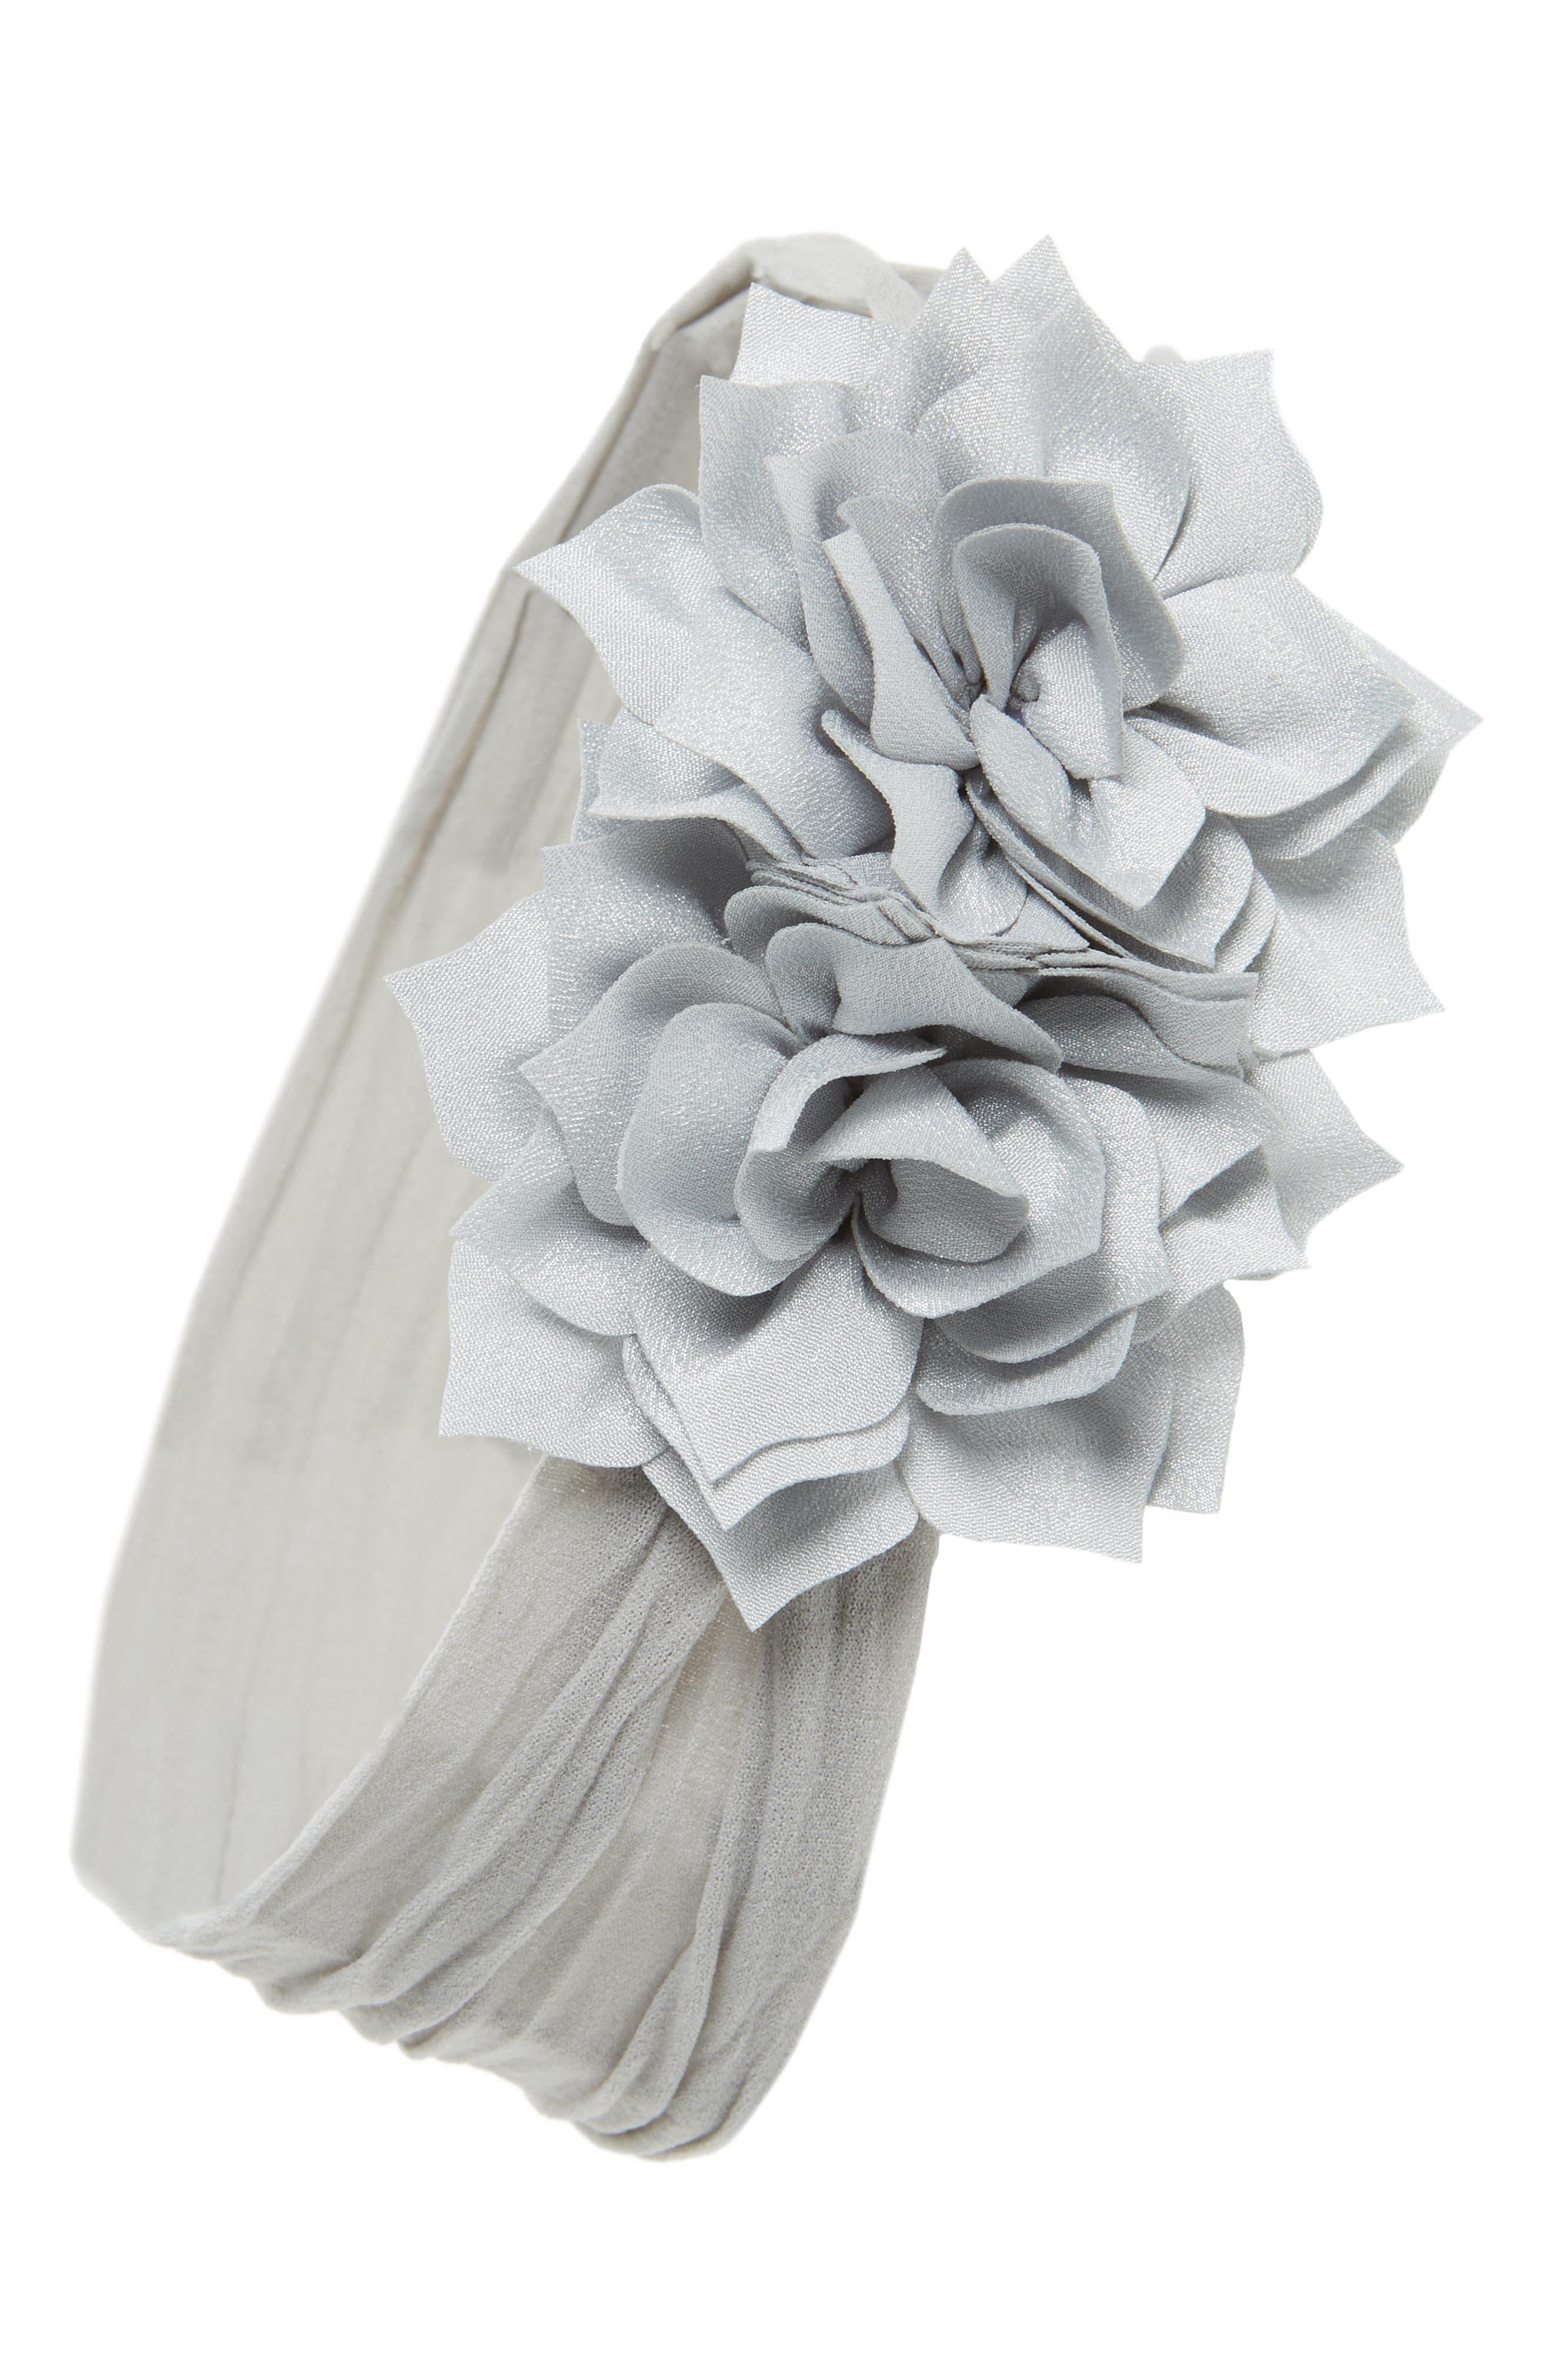 Main Image - Baby Bling Holiday Poinsettia Flower Headband (Baby Girls)